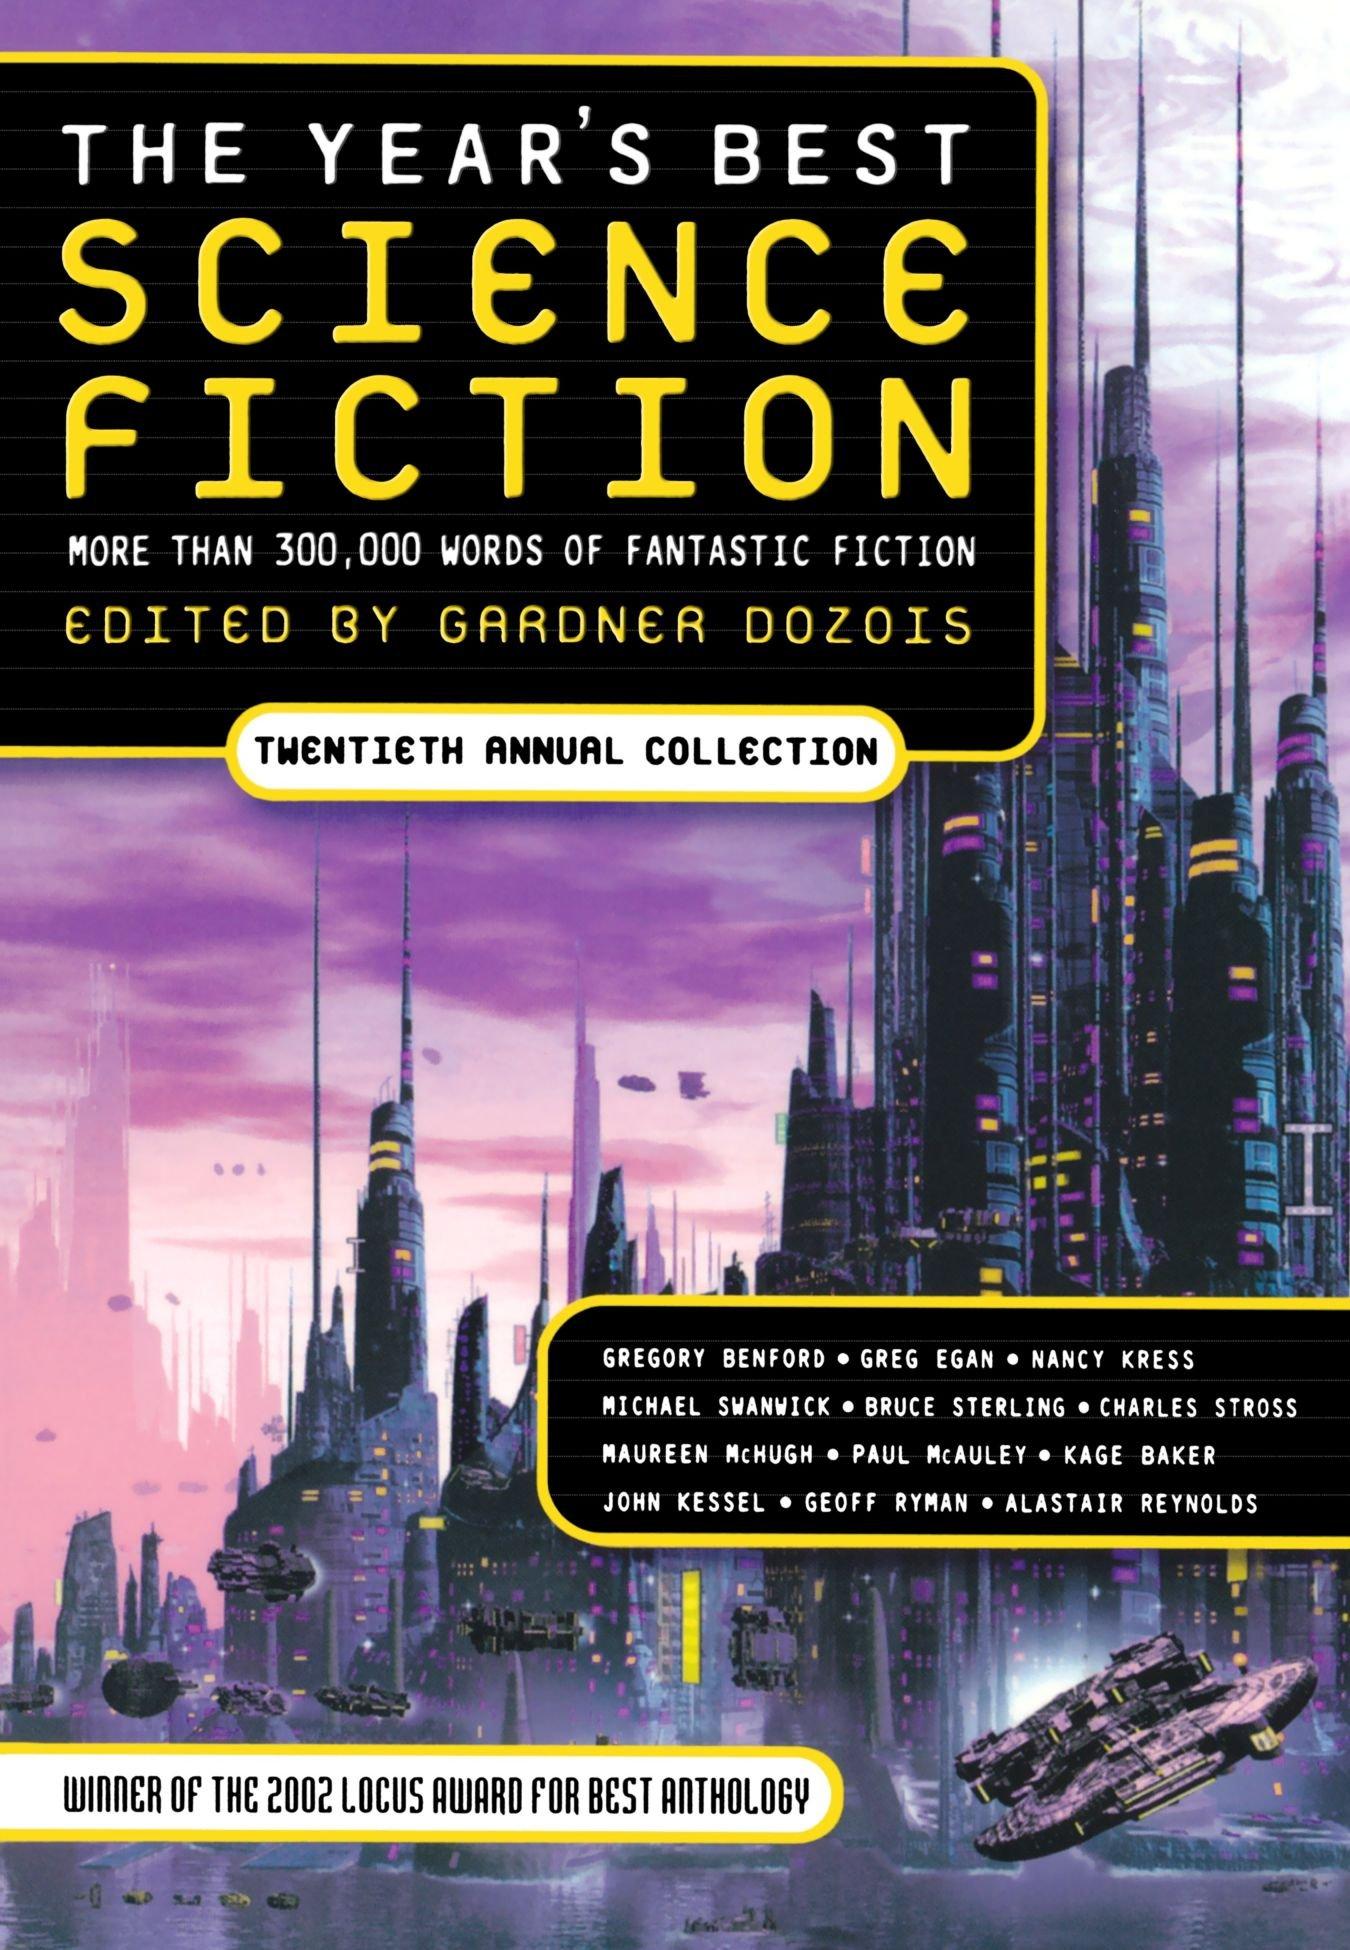 The best Soviet science fiction movie. Fourth round 22